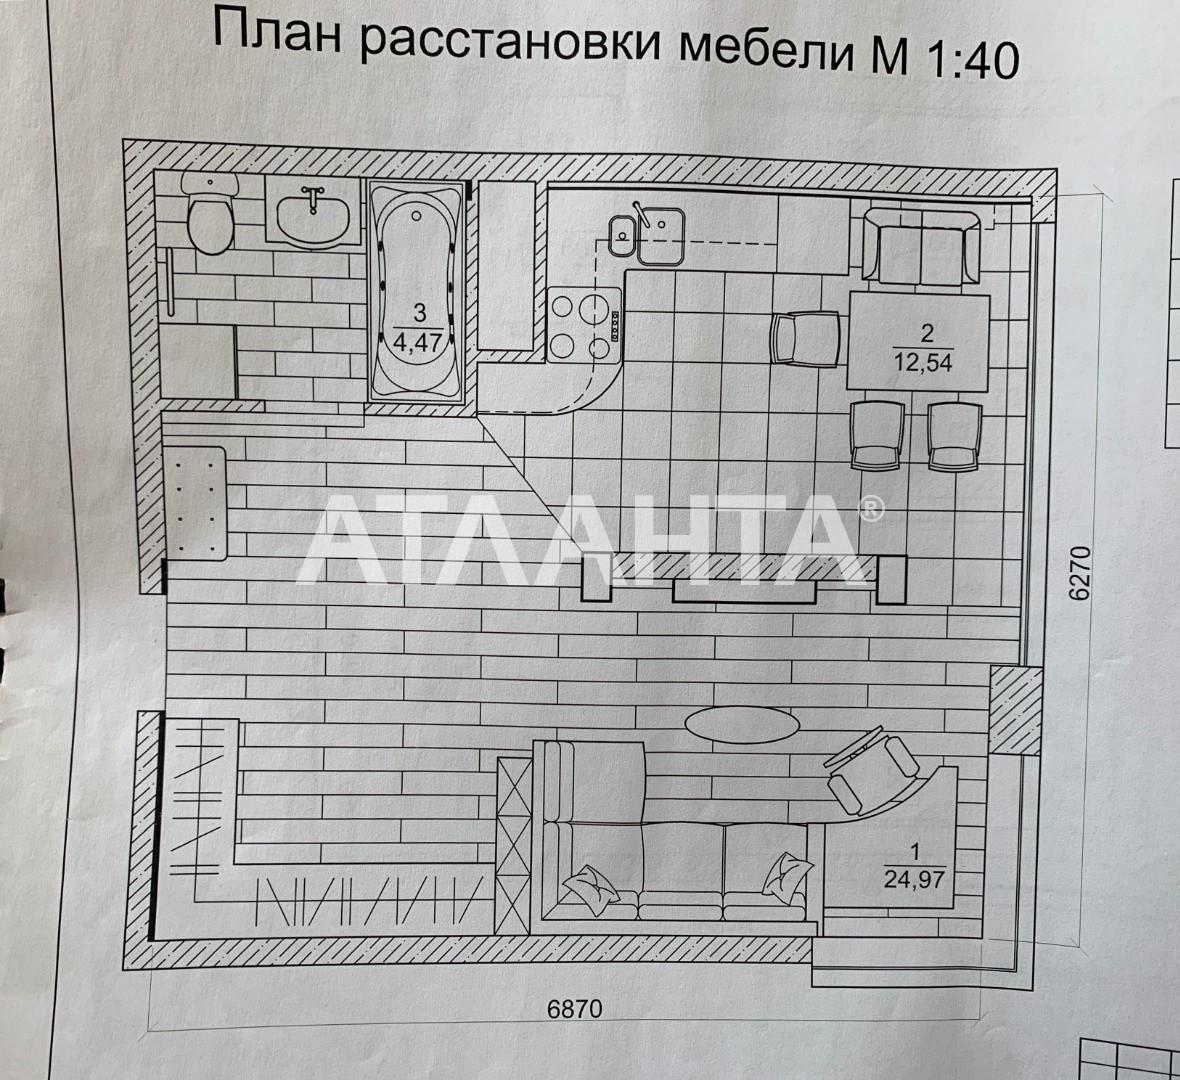 Продается 1-комнатная Квартира на ул. Балковская (Фрунзе) — 50 000 у.е. (фото №26)